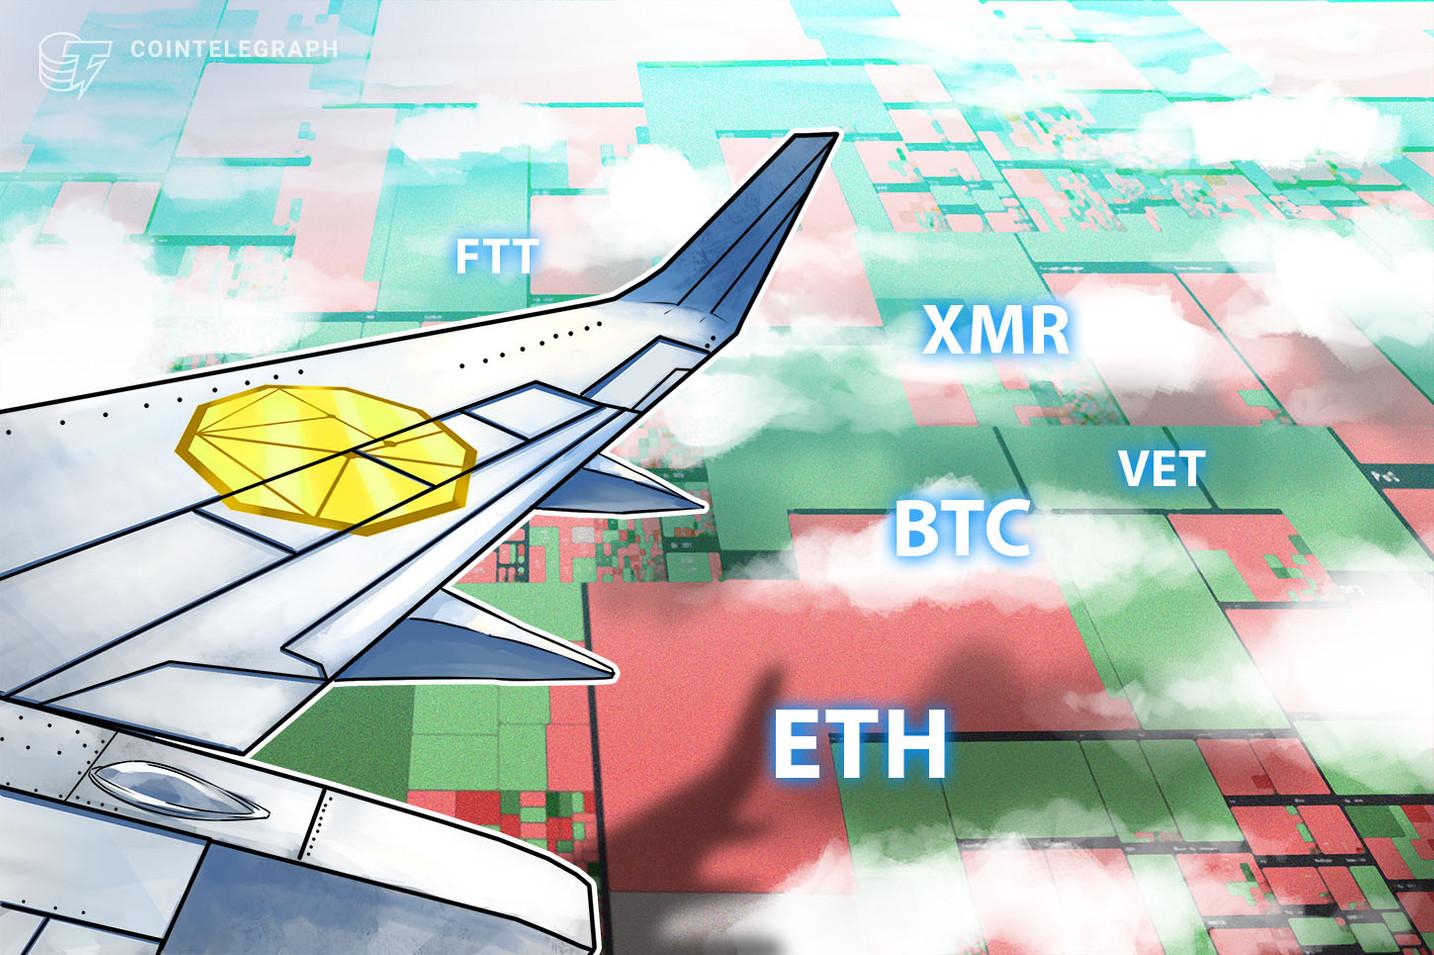 Top 5 cryptocurrencies to watch this week: BTC, ETH, VET, XMR, FTT